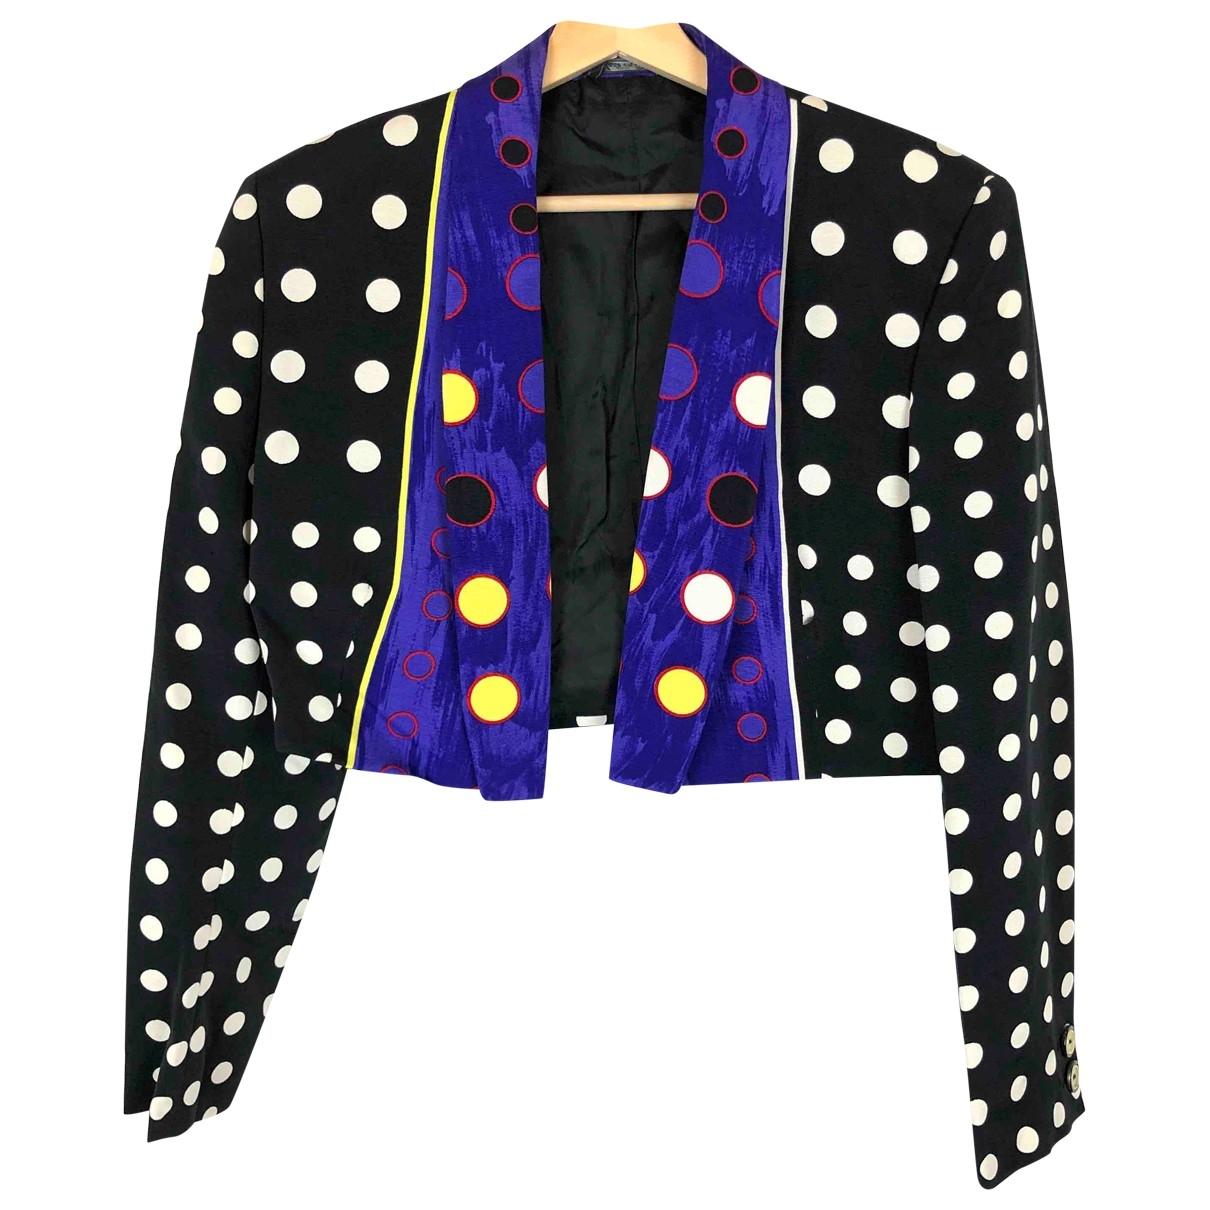 Gianni Versace \N Black jacket for Women 44 IT